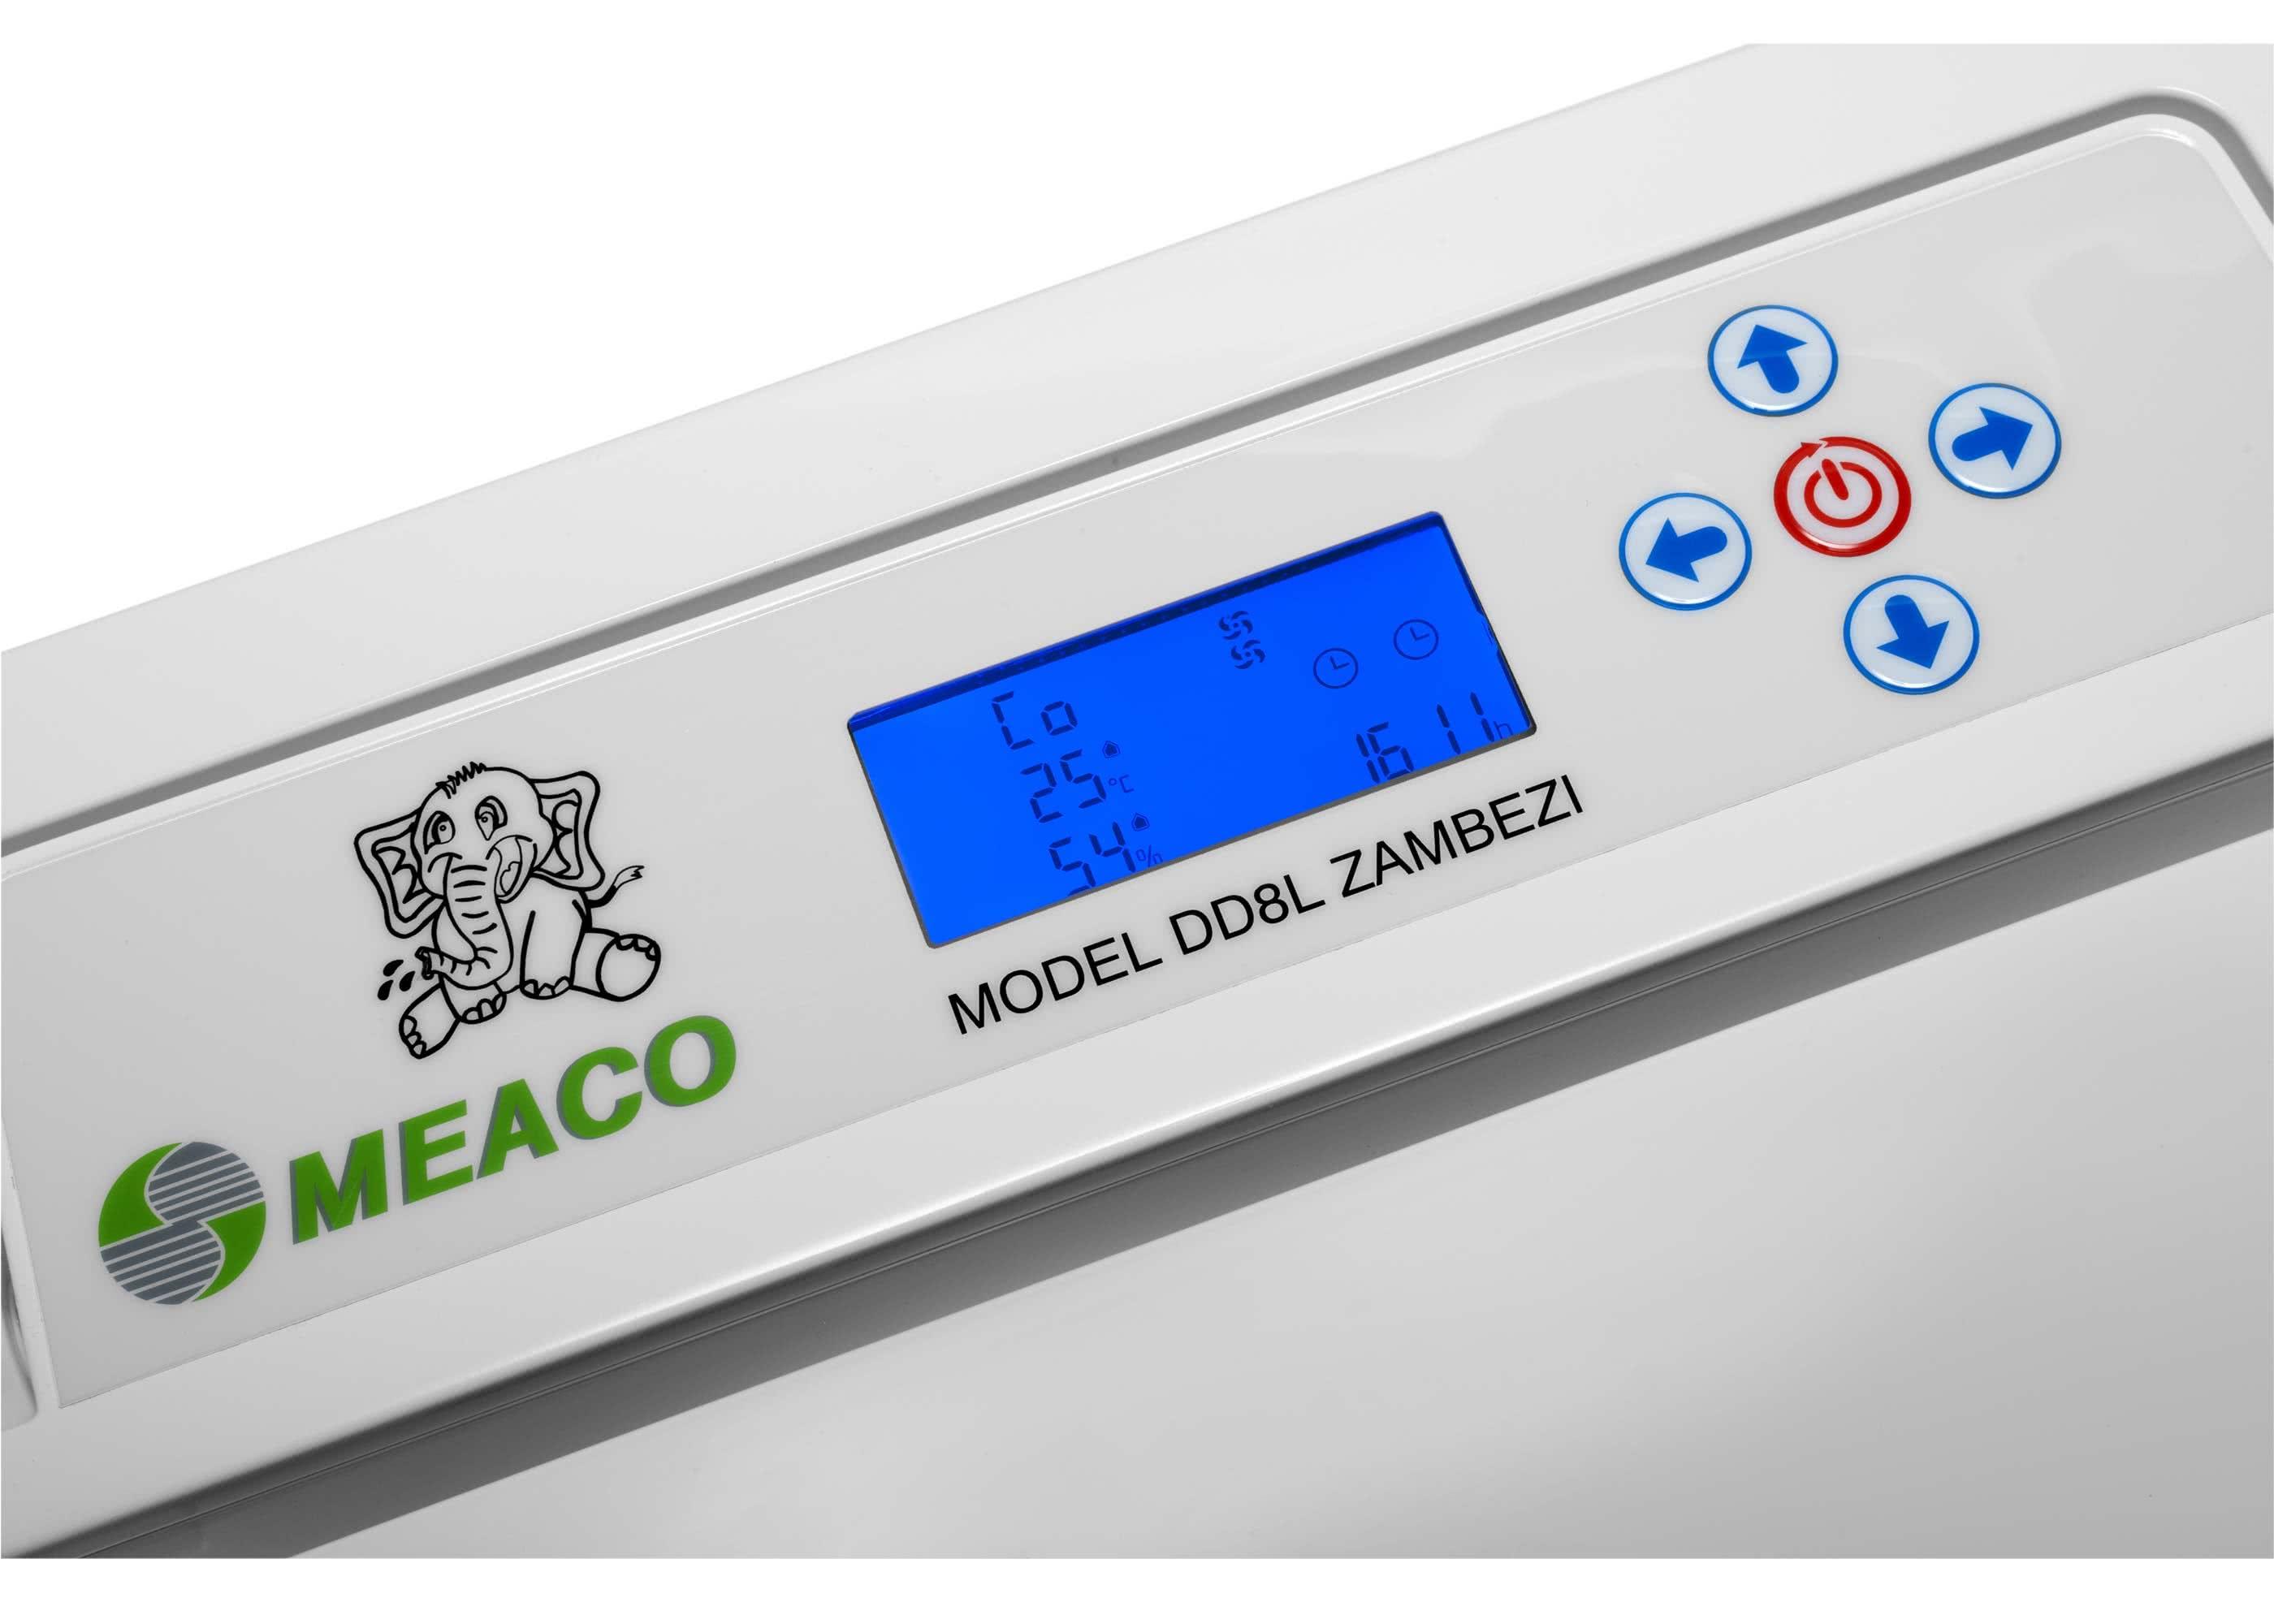 40718_MEACO_Luftentfeuchter_DD8L_ZAMBEZI_display.jpg